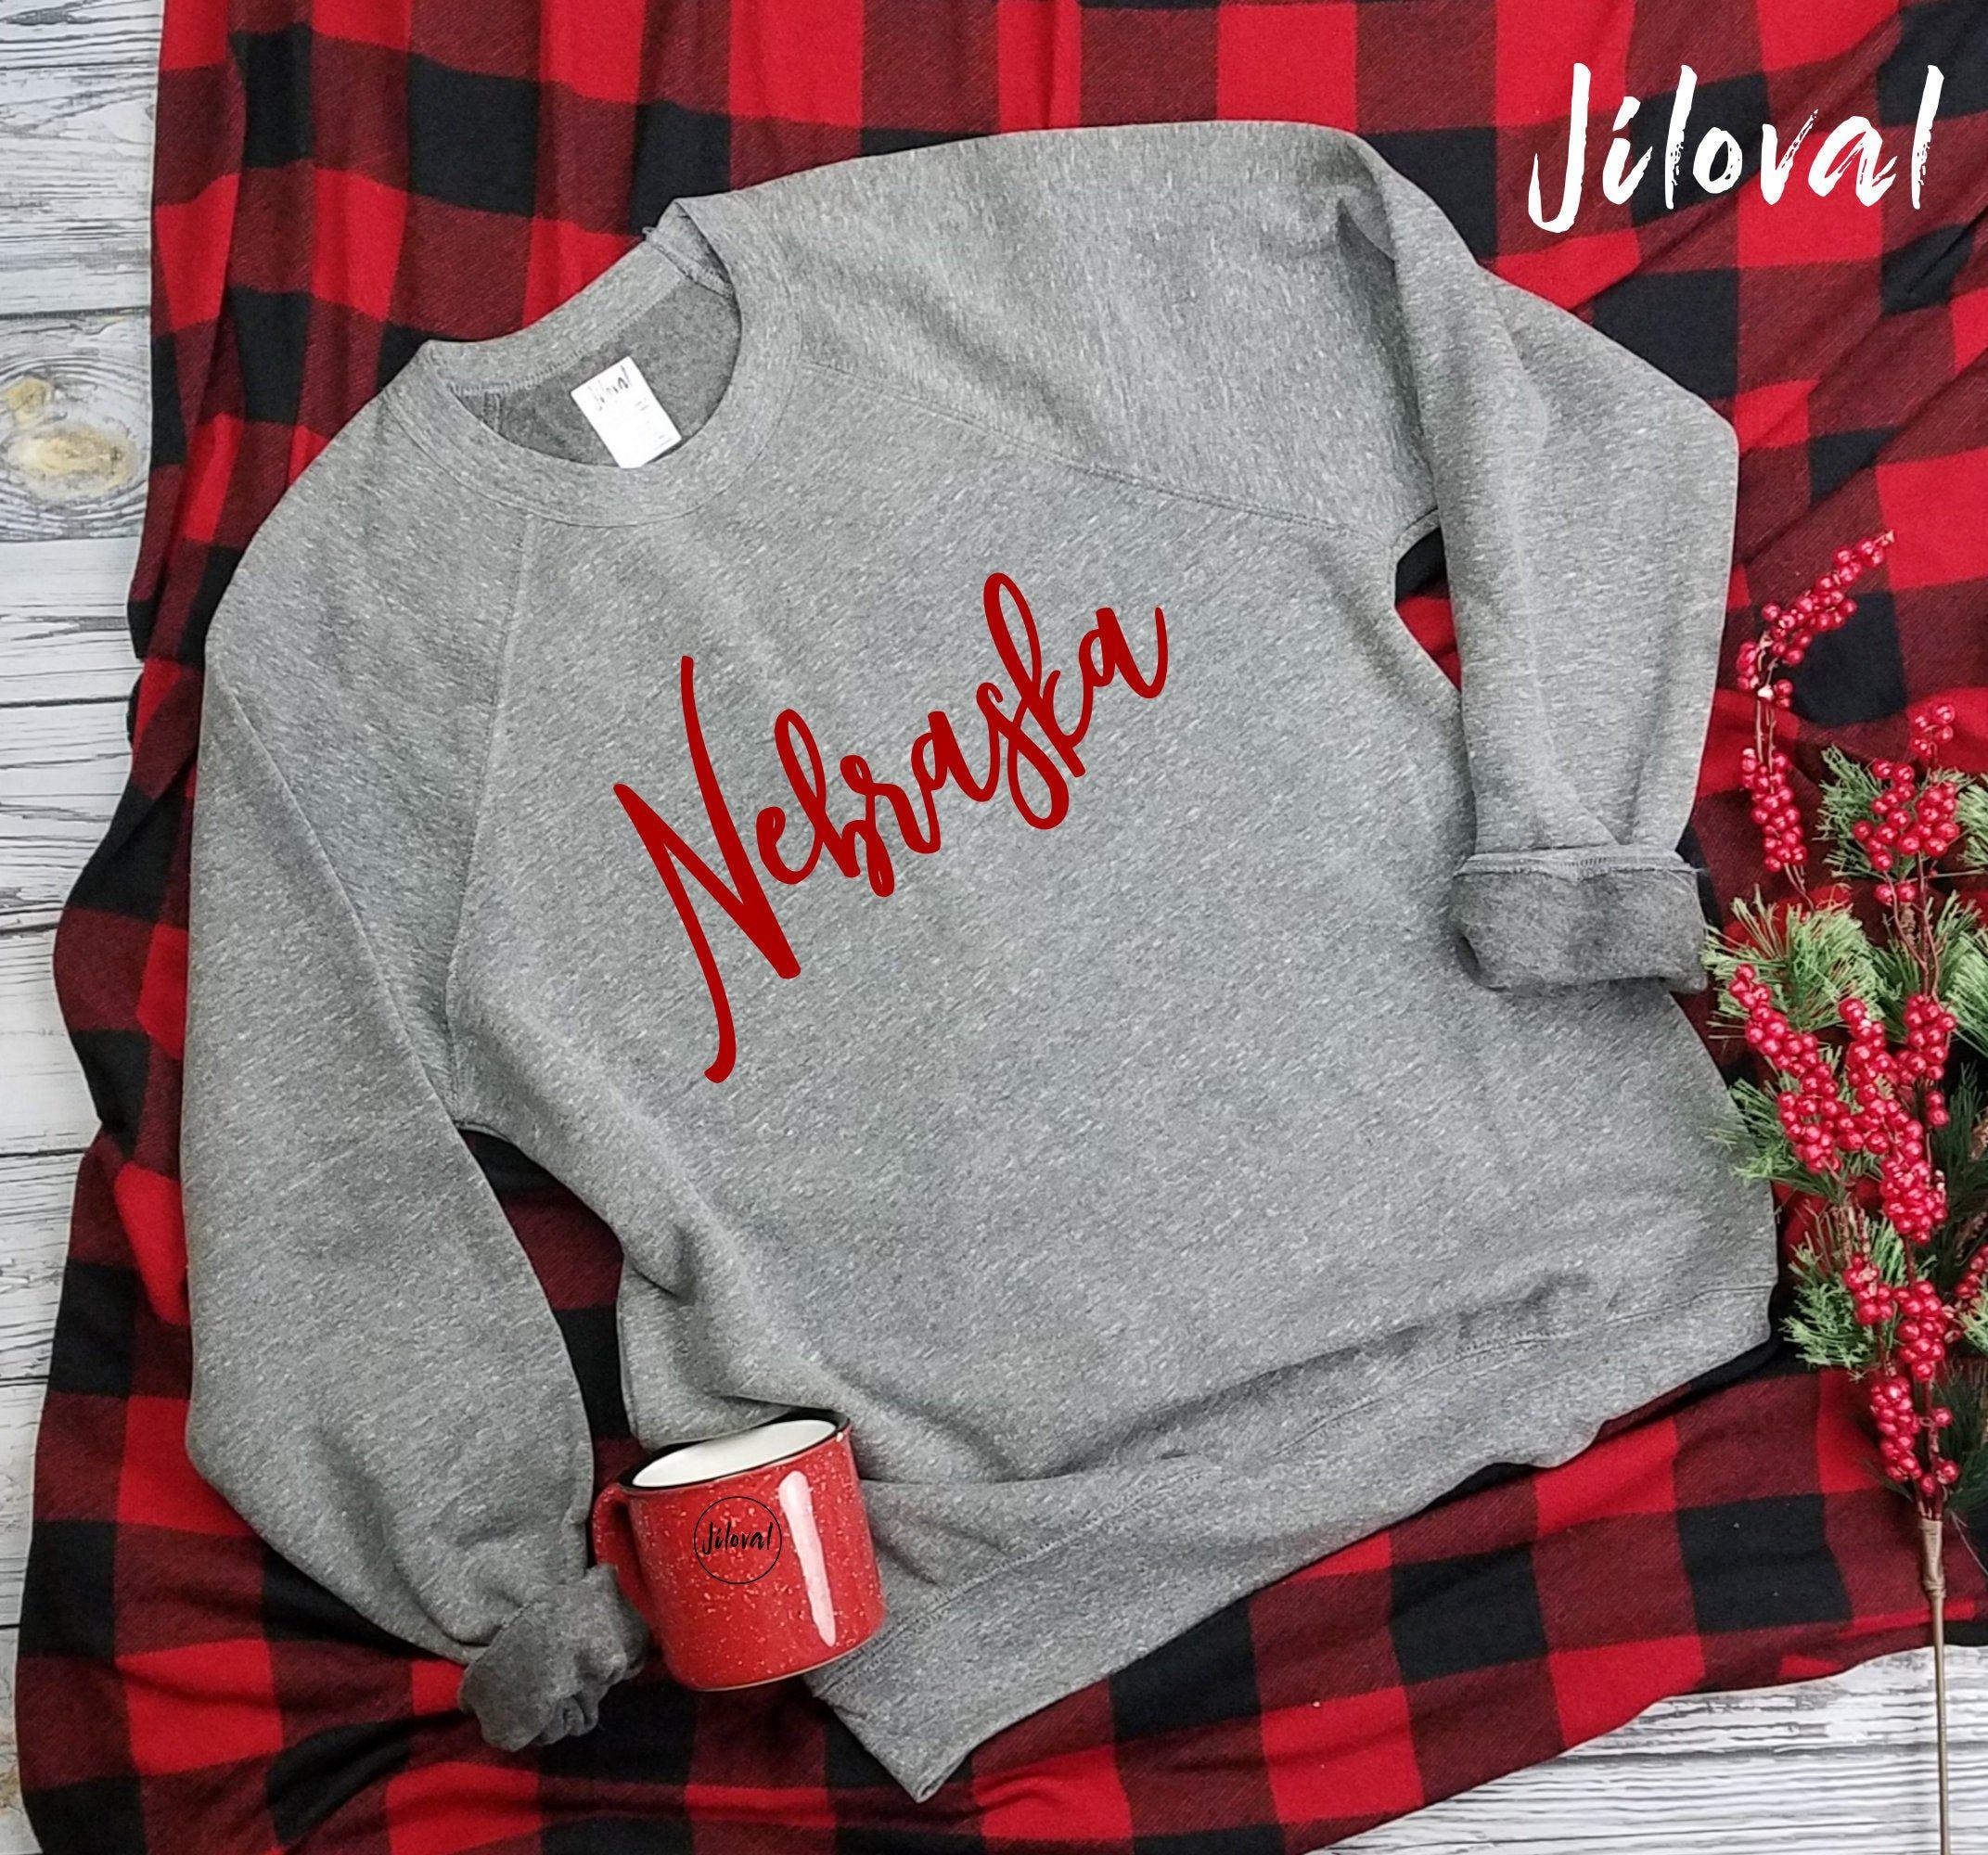 Nebraska Sweatshirt Cozy Nebraska Sweatshirt Long Sleeve Etsy Long Sweatshirt Sweatshirts Adulting Shirts [ 2000 x 2143 Pixel ]